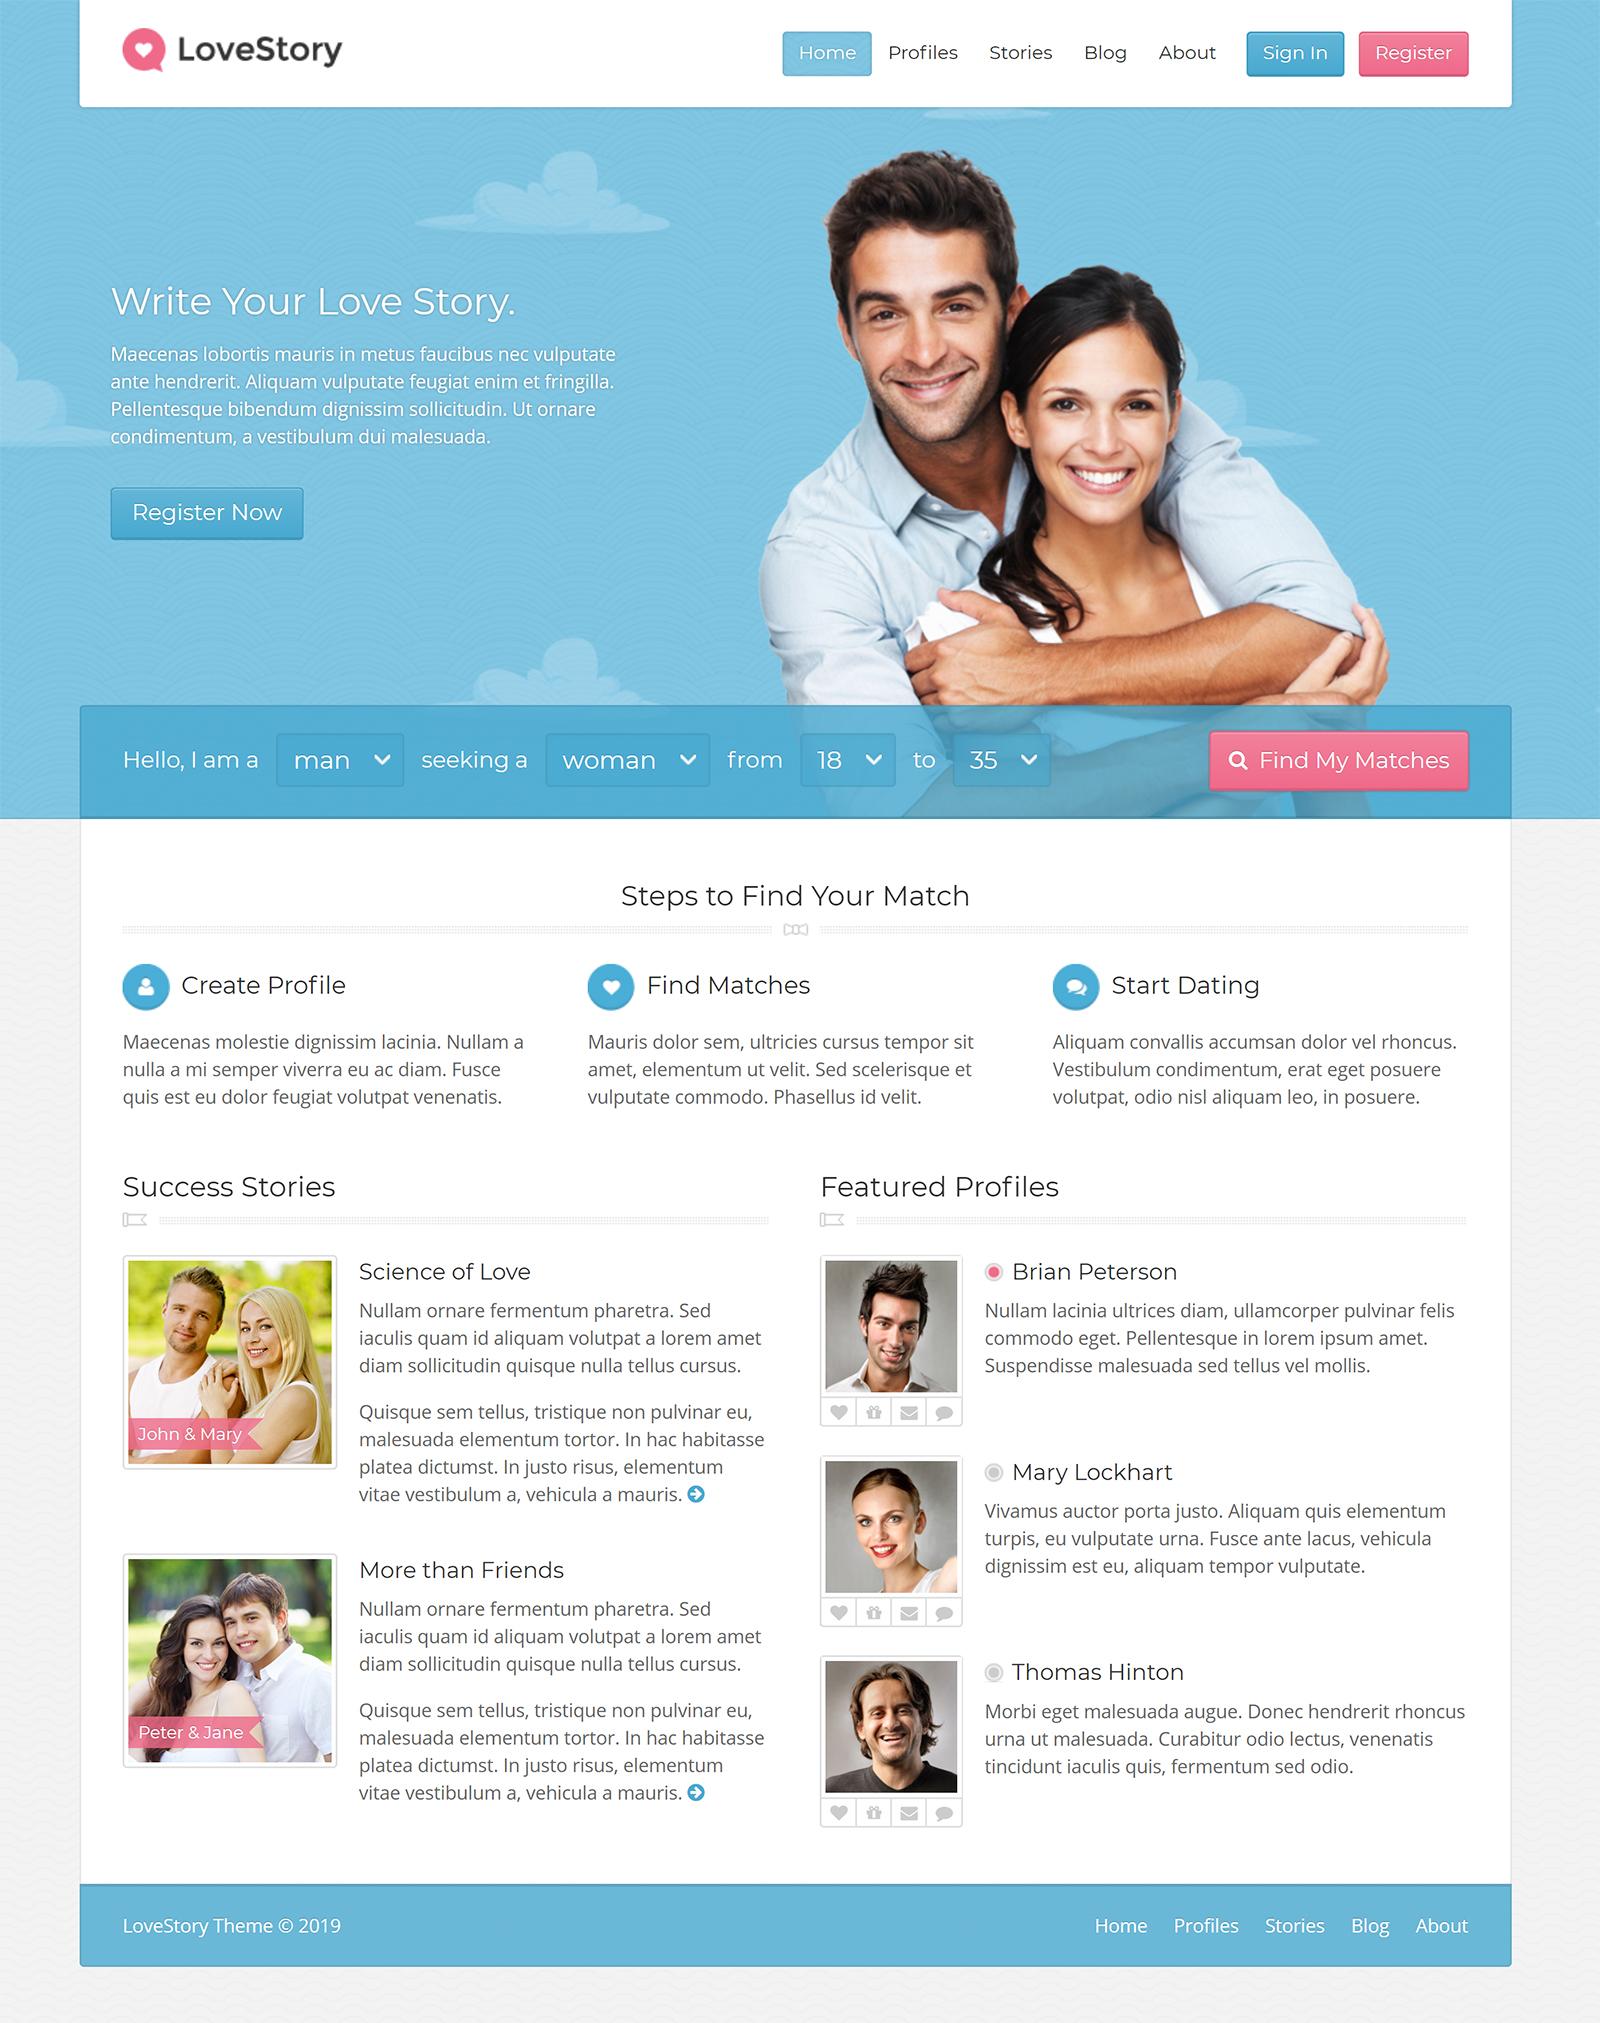 LoveStory WordPress Theme